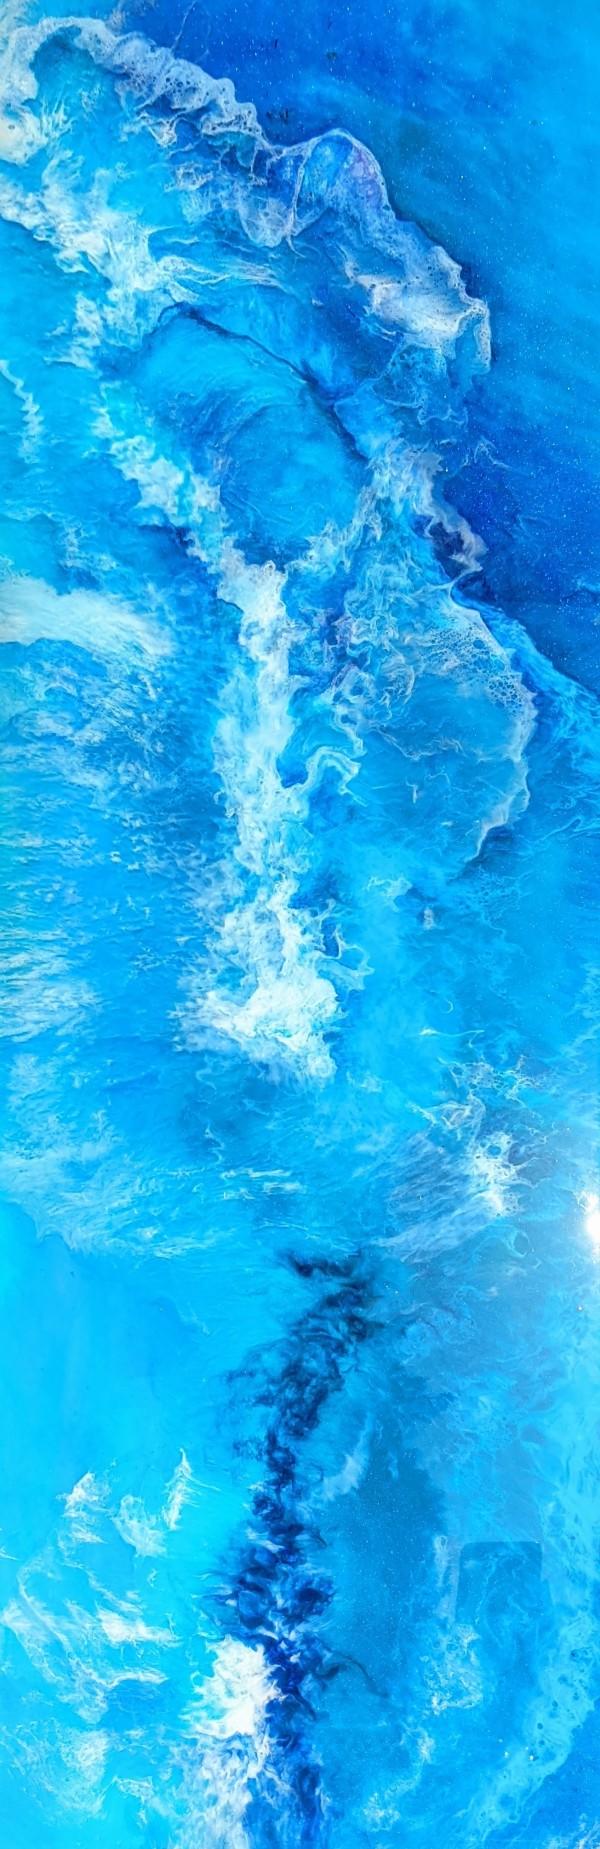 off shore by Kellie Kawahara-Niimi